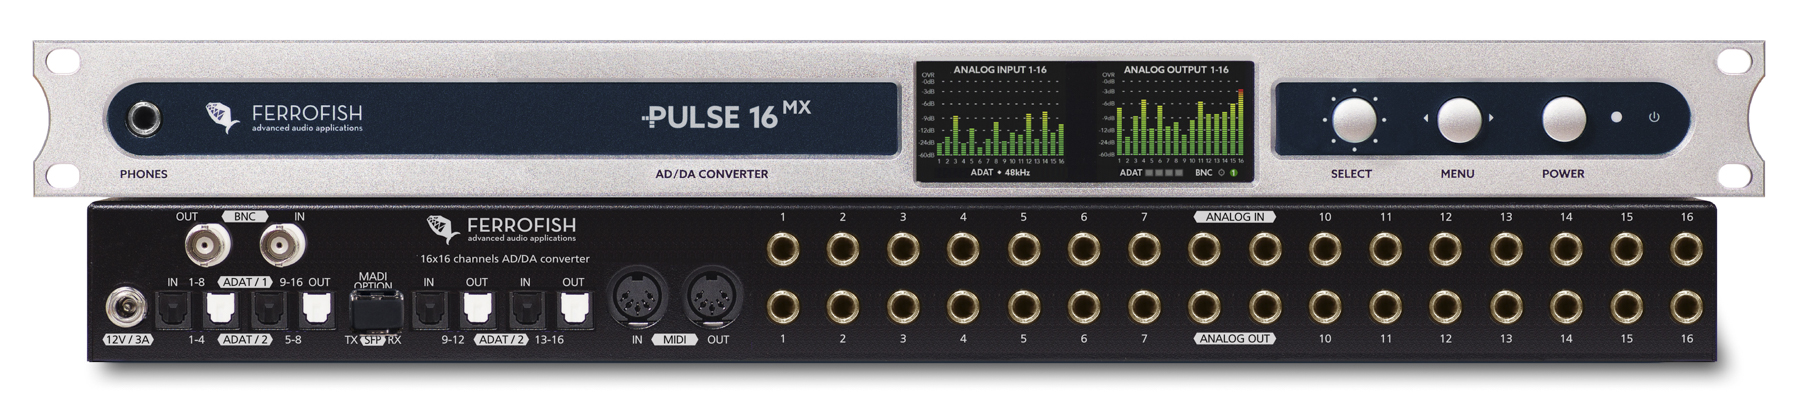 News: Ferrofish Pulse 16 MX mit flexibler MADI-Schnittstelle